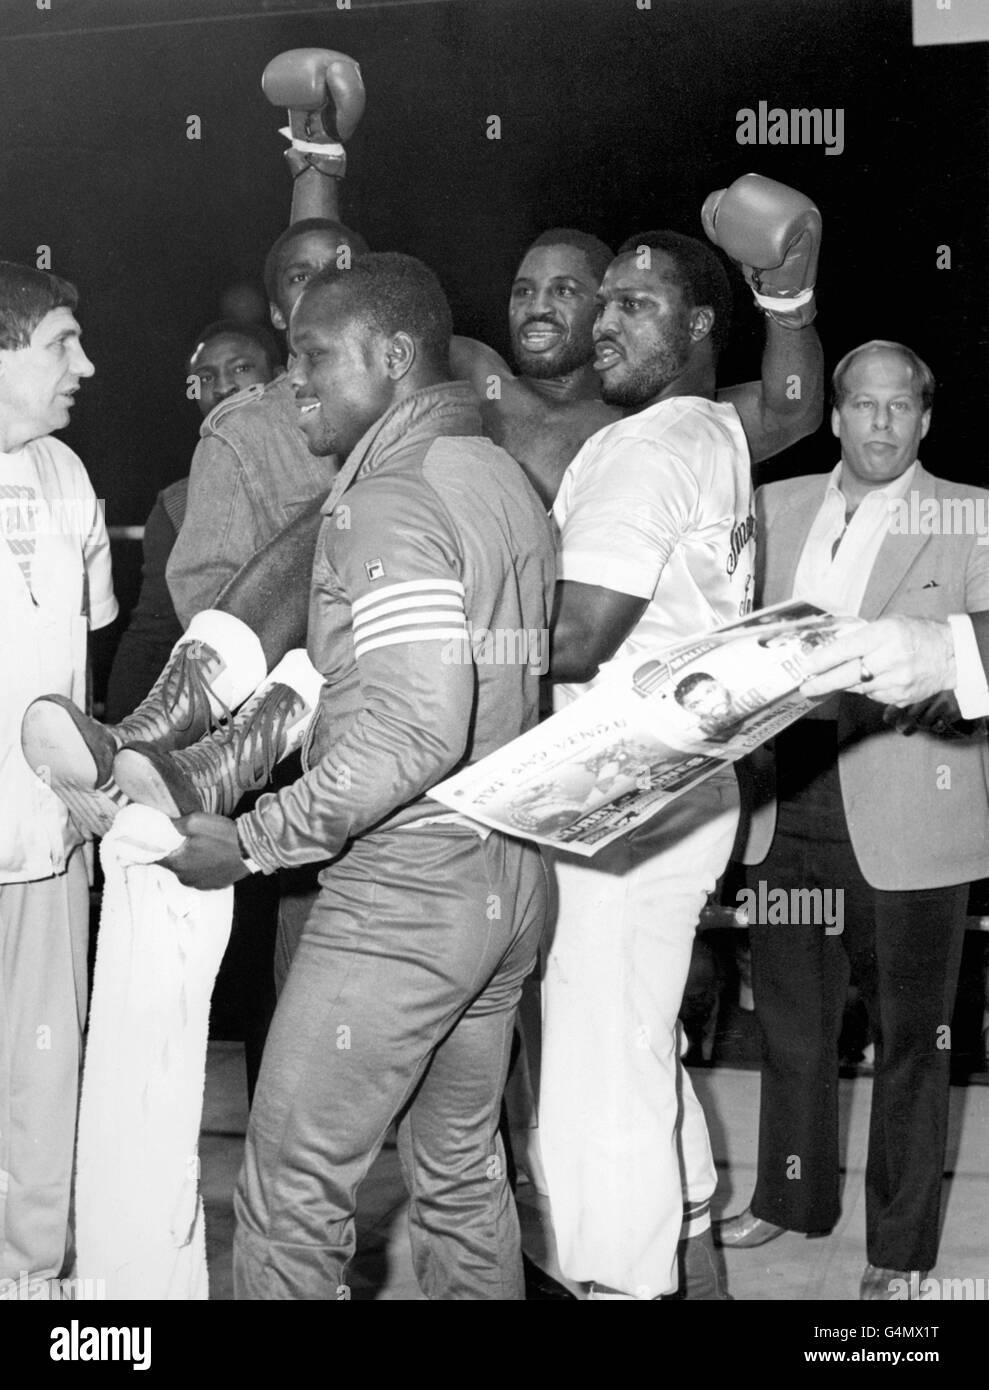 Boxing - Heavyweight - Marvis Frazier v Funso Banjo - Alexandra Pavilion, London - Stock Image